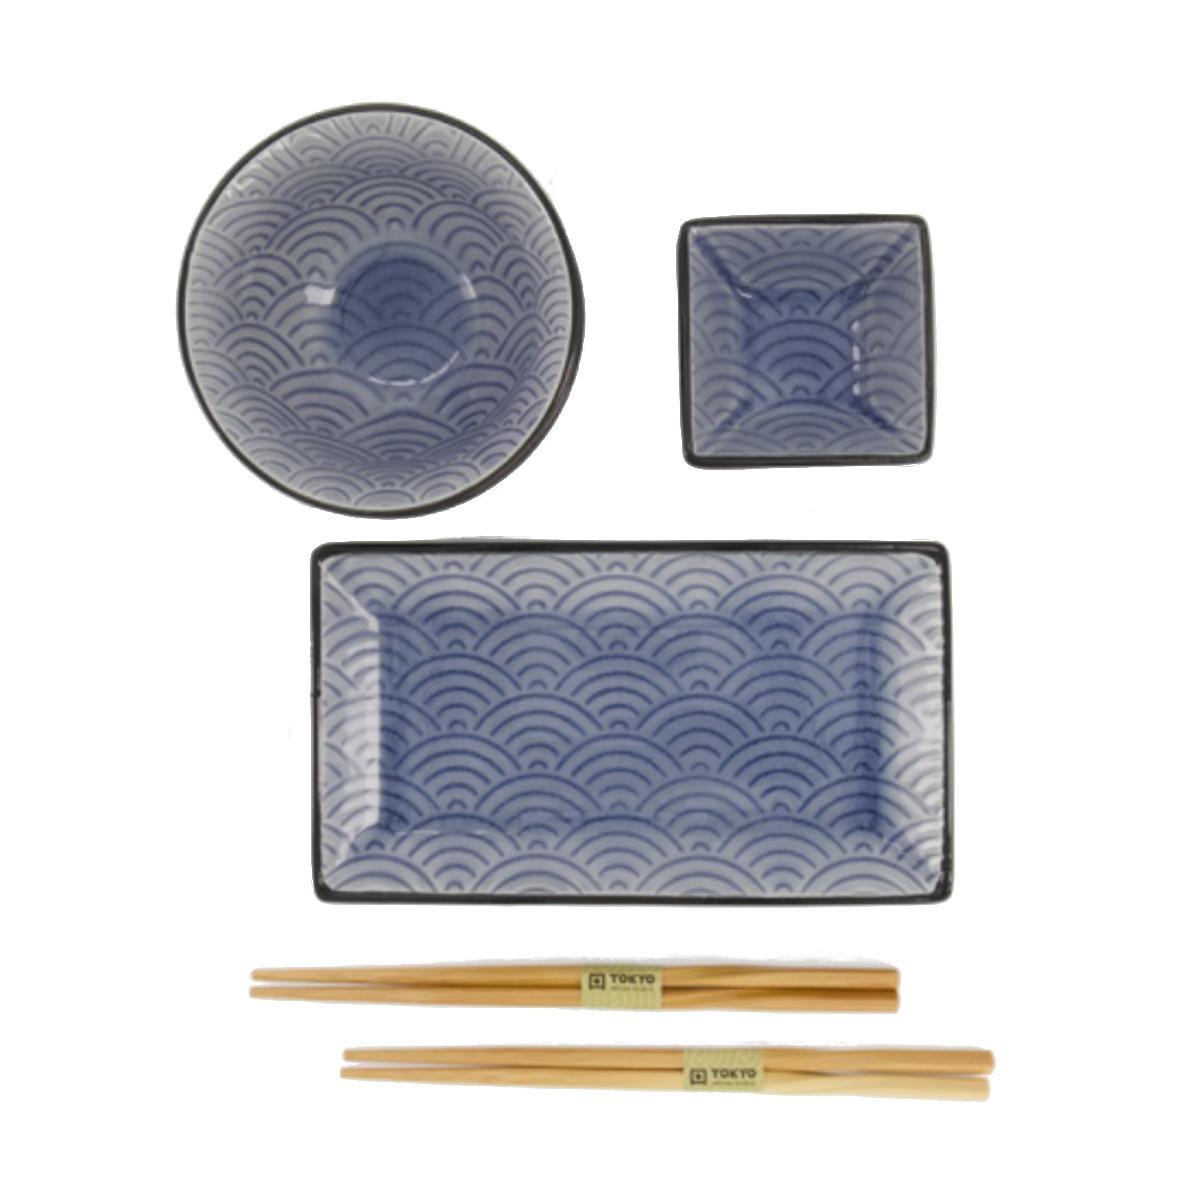 Tokyo Design Studio Tokyo Design Studio Glassy Glassy Blue Wave  6-teiliges Sushi Geschirr Set